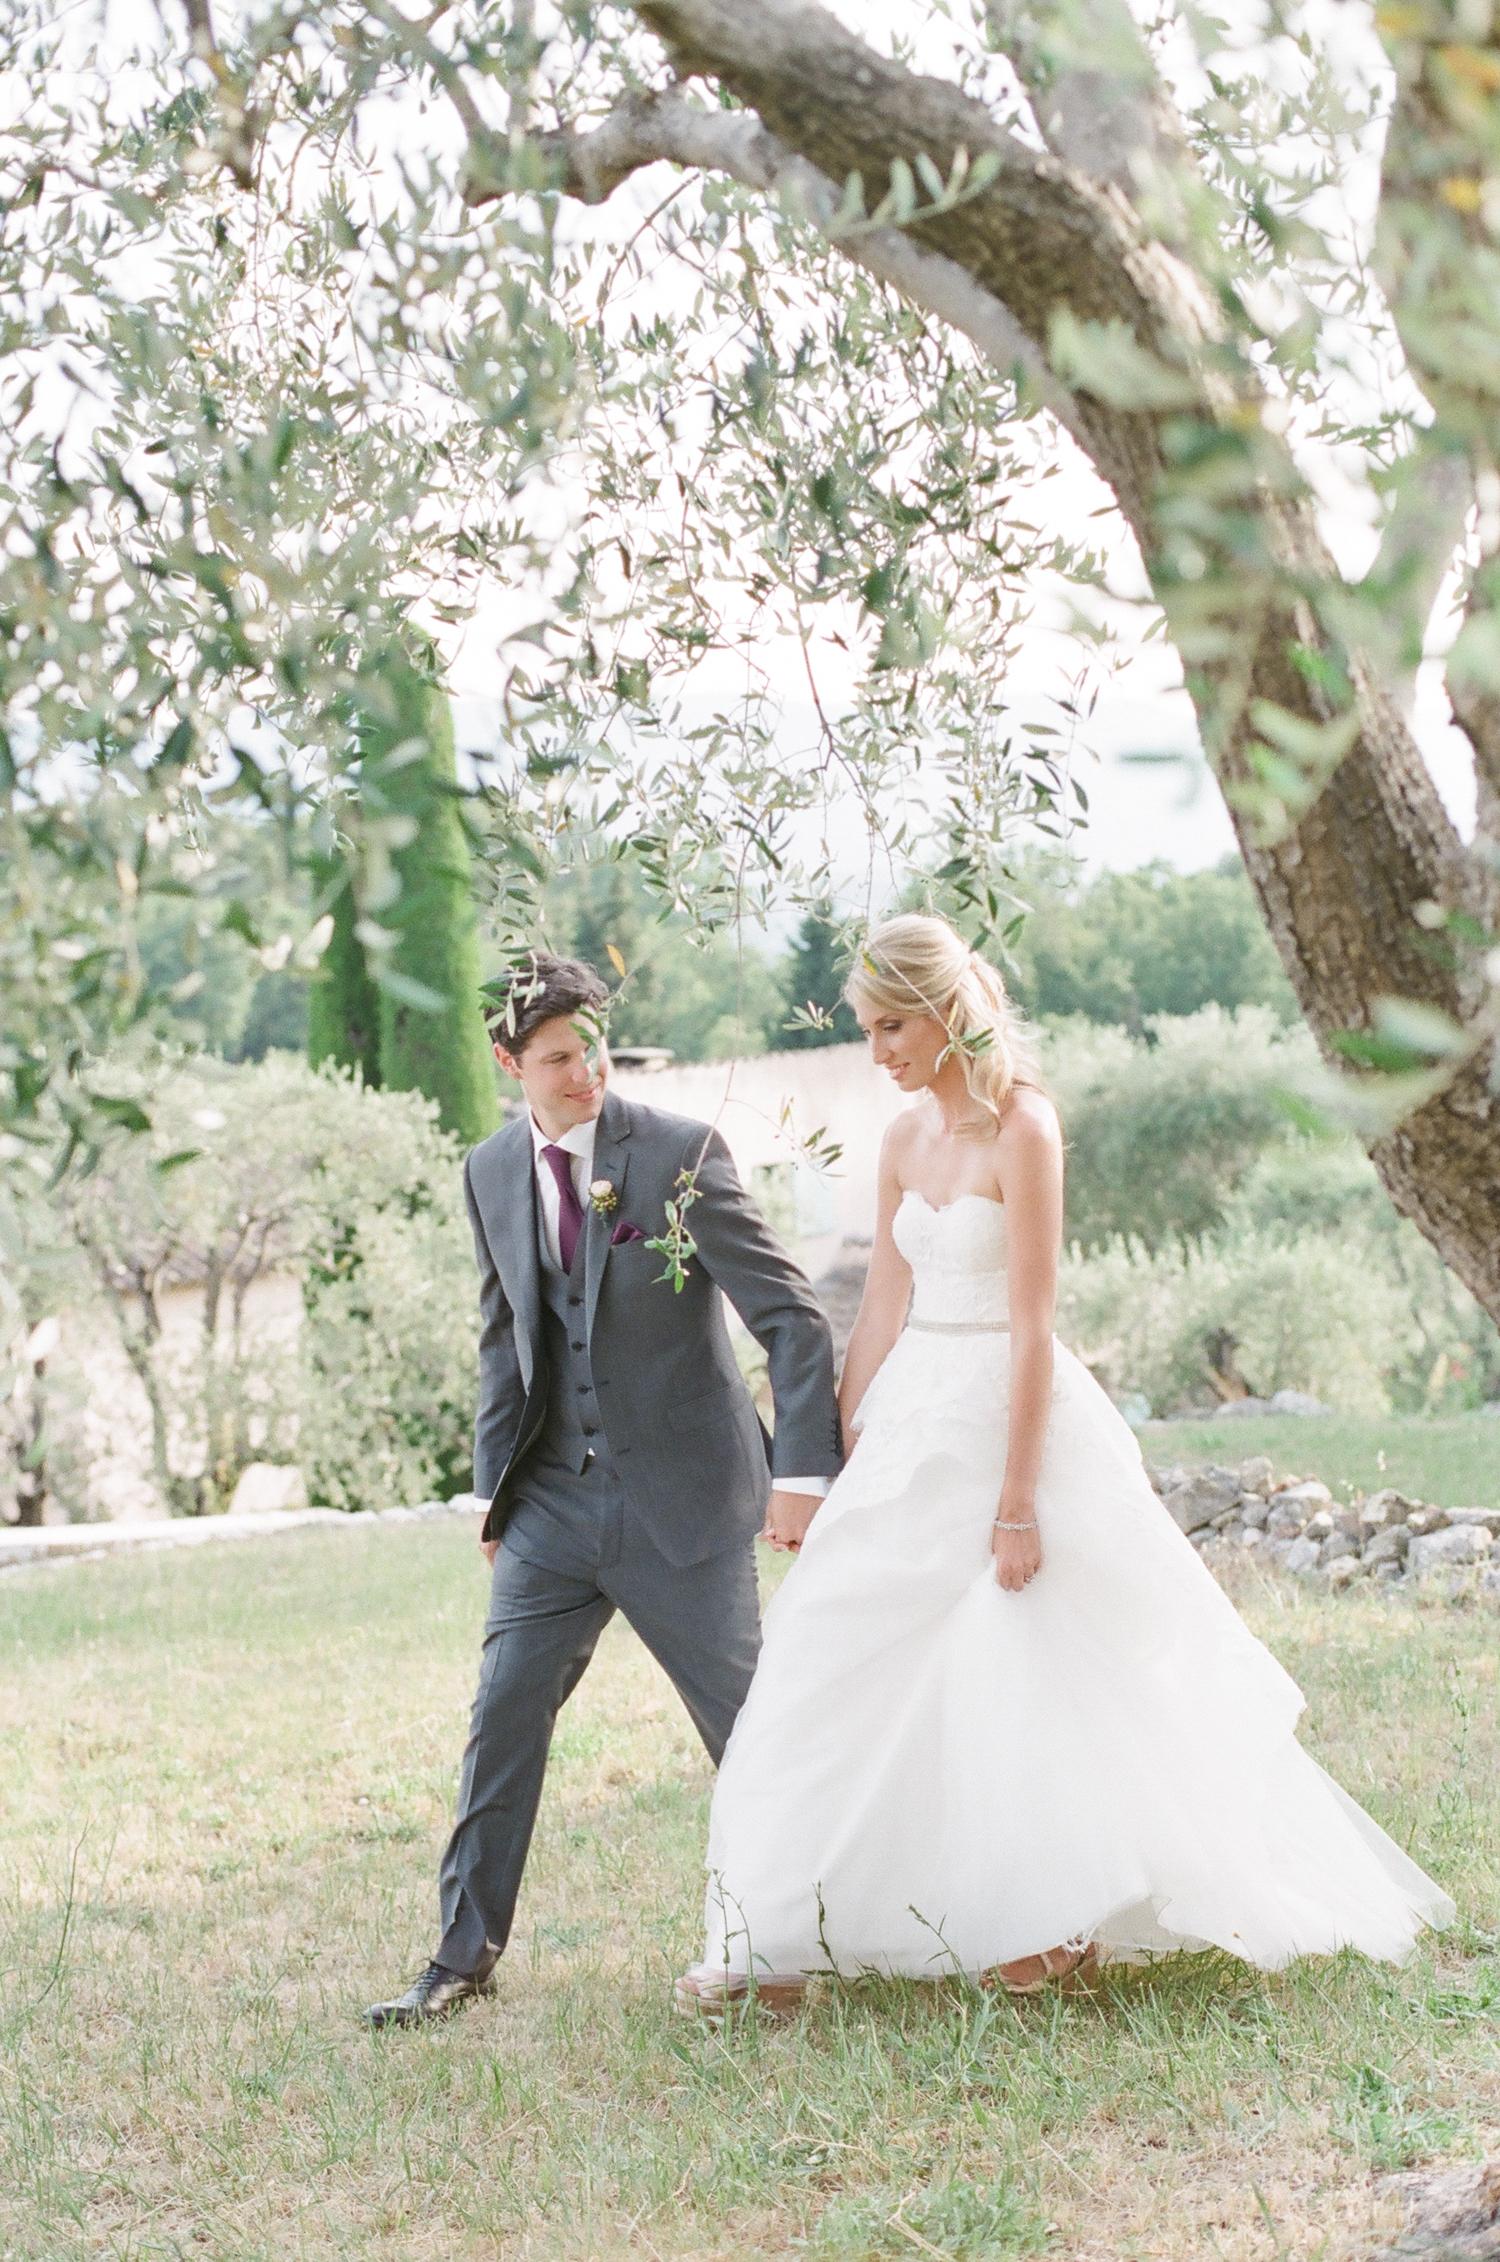 French_Wedding_(c)_Rory_Wylie-45.jpg